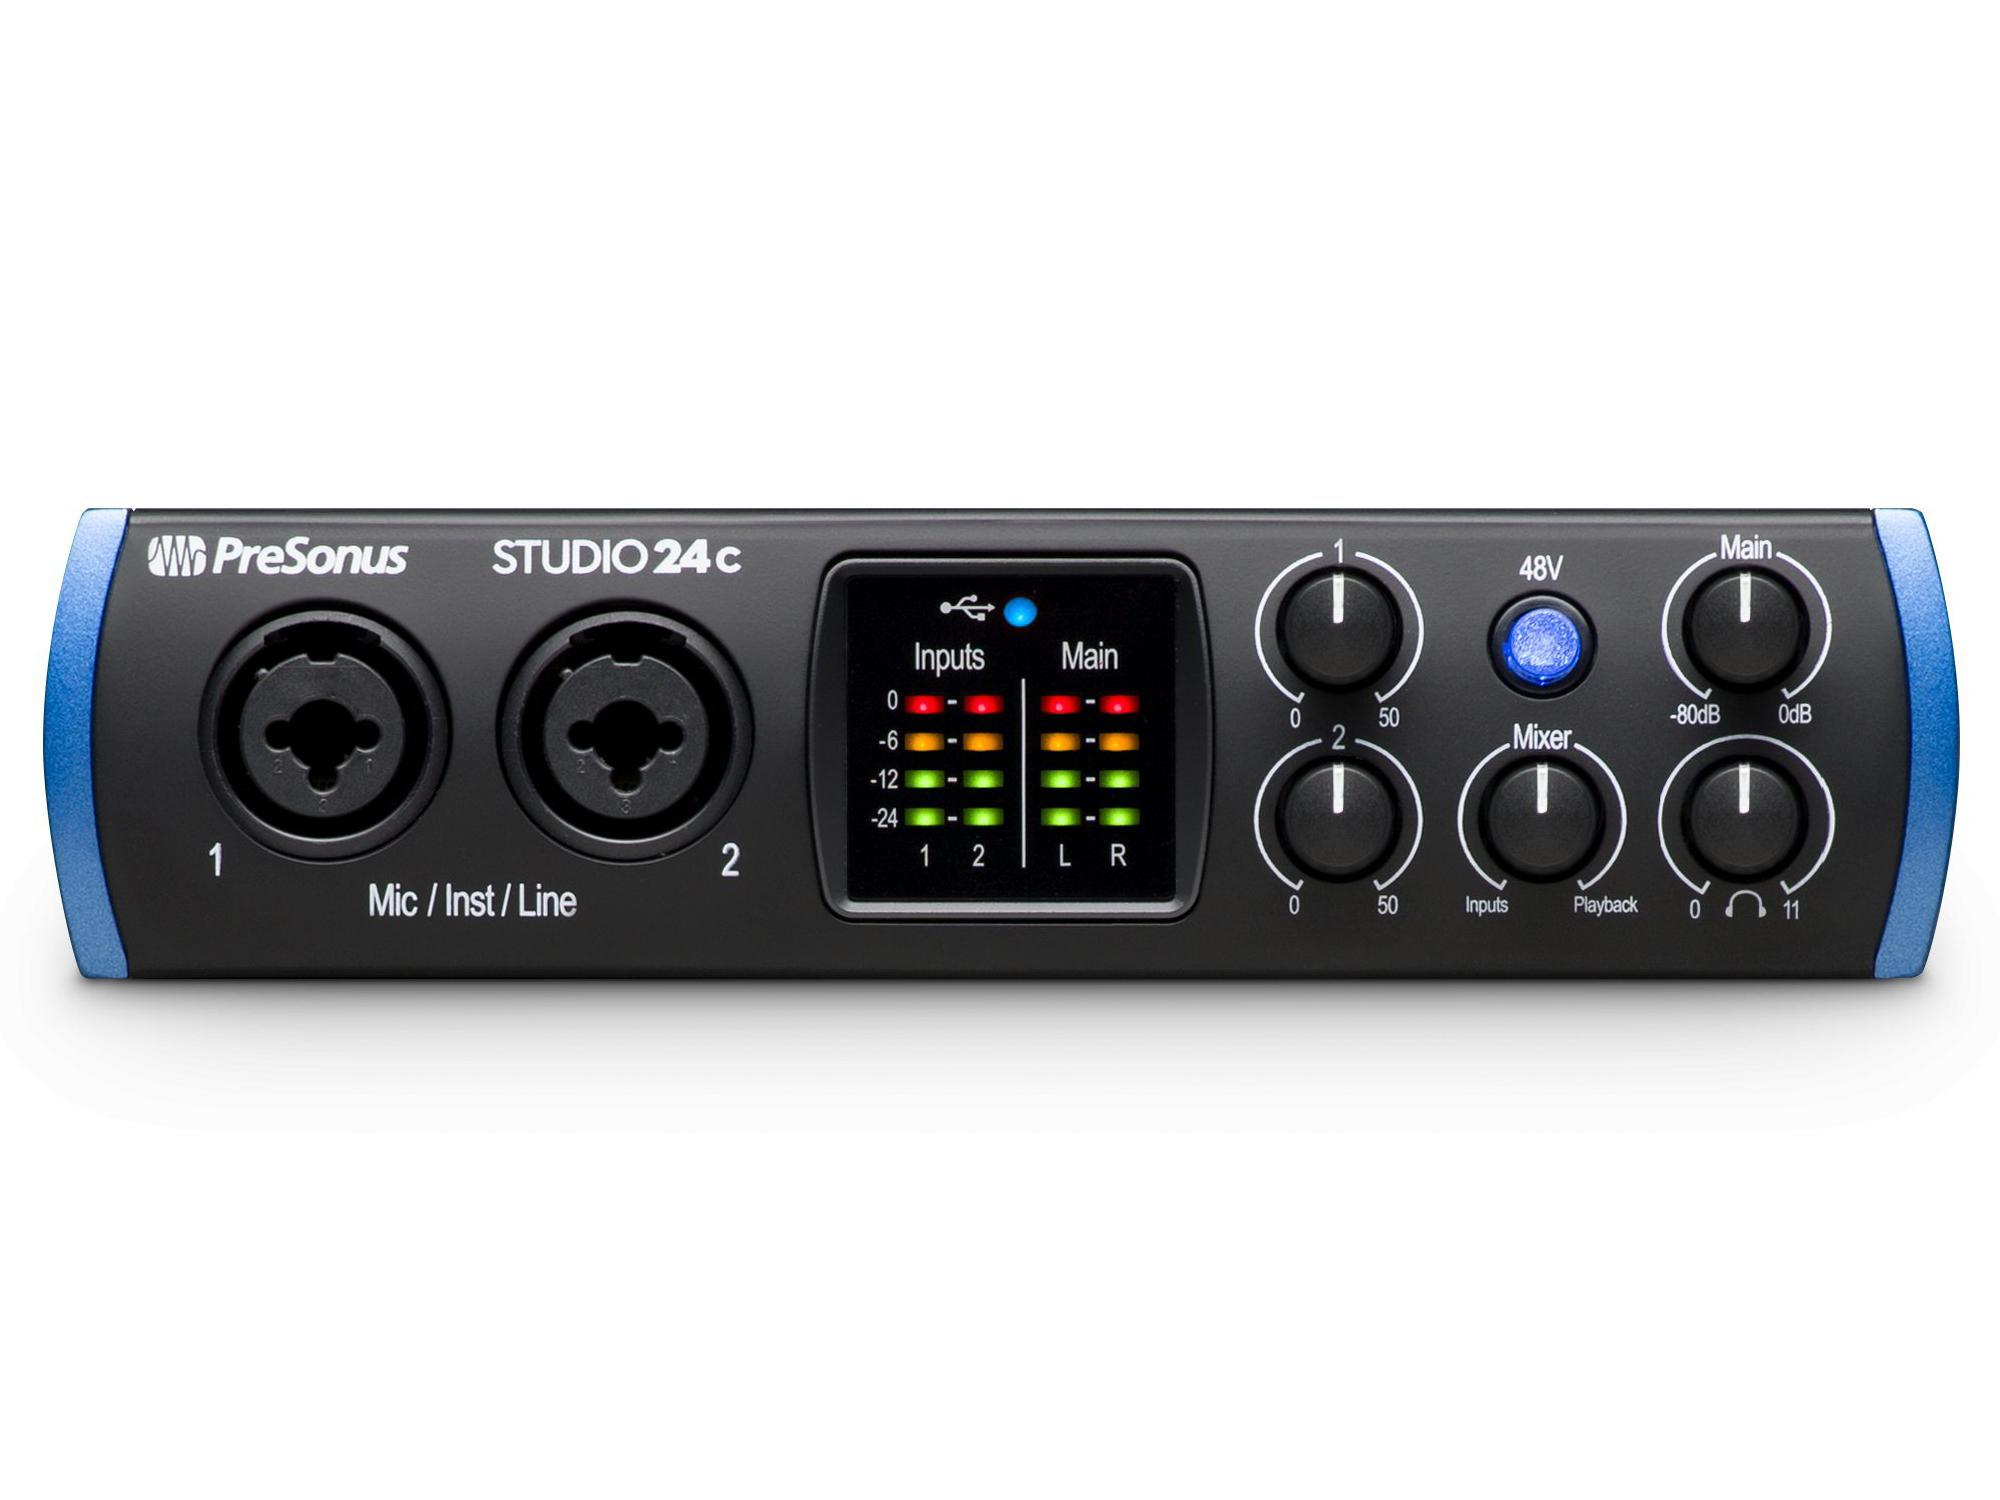 PreSonus Studio 24c The portable ultra-high-def 2X2 USB-C Audio Interface with 2 Mic inputs/24-bit/192kHz